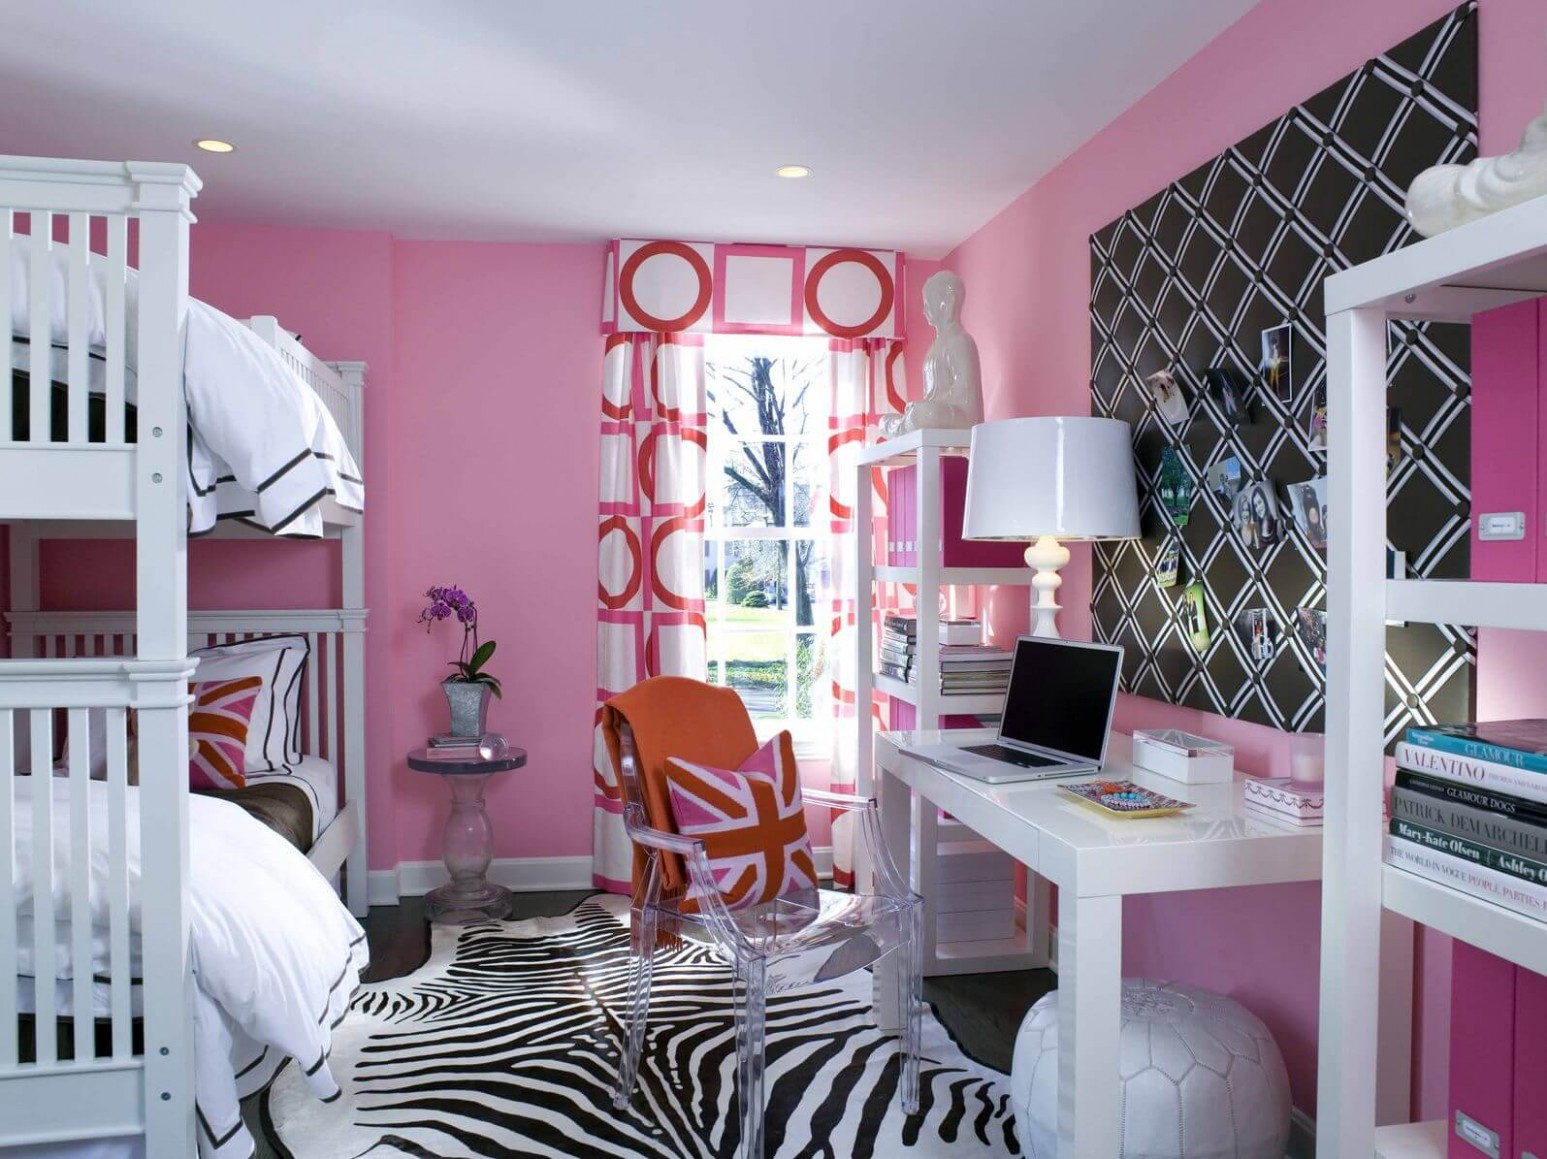 12 Zebra Bedroom Décor Themes, Ideas & Designs (Pictures) - Zebra Bedroom Ideas